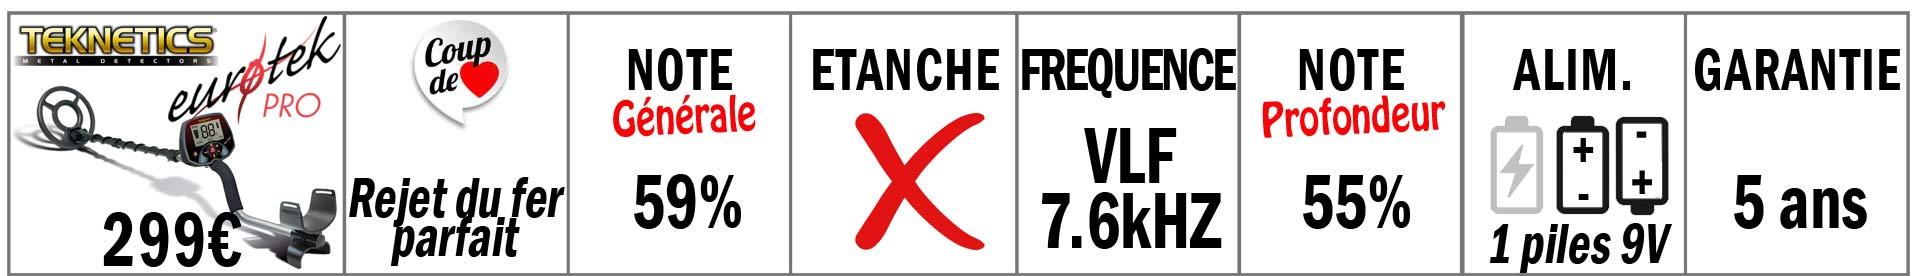 note teknetics eurotek pro 20cm